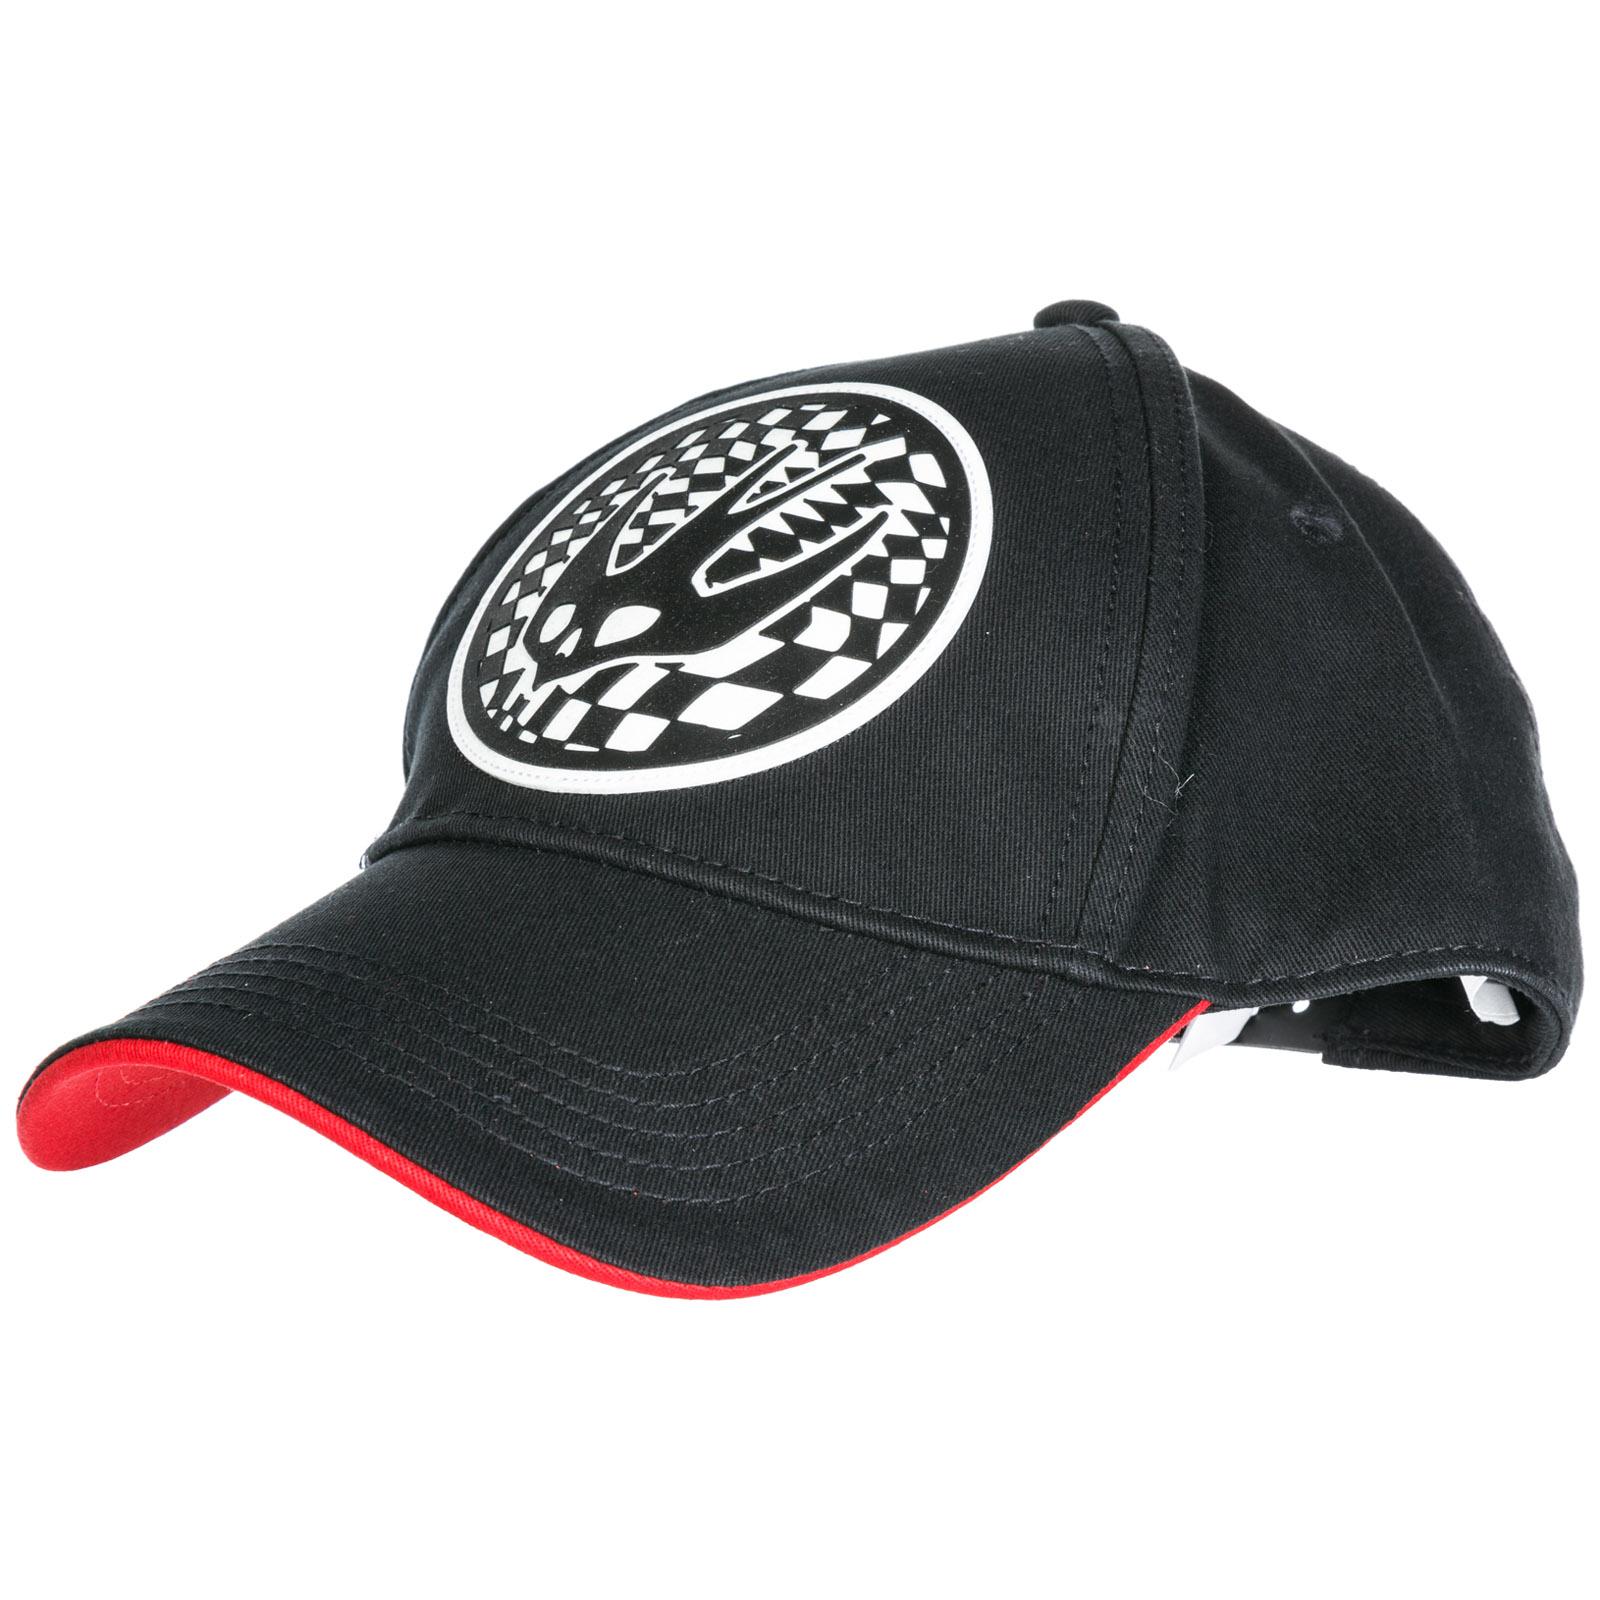 ddb657d2f Mcq By Alexander Mcqueen Adjustable Men'S Cotton Hat Baseball Cap Swallow  In Black